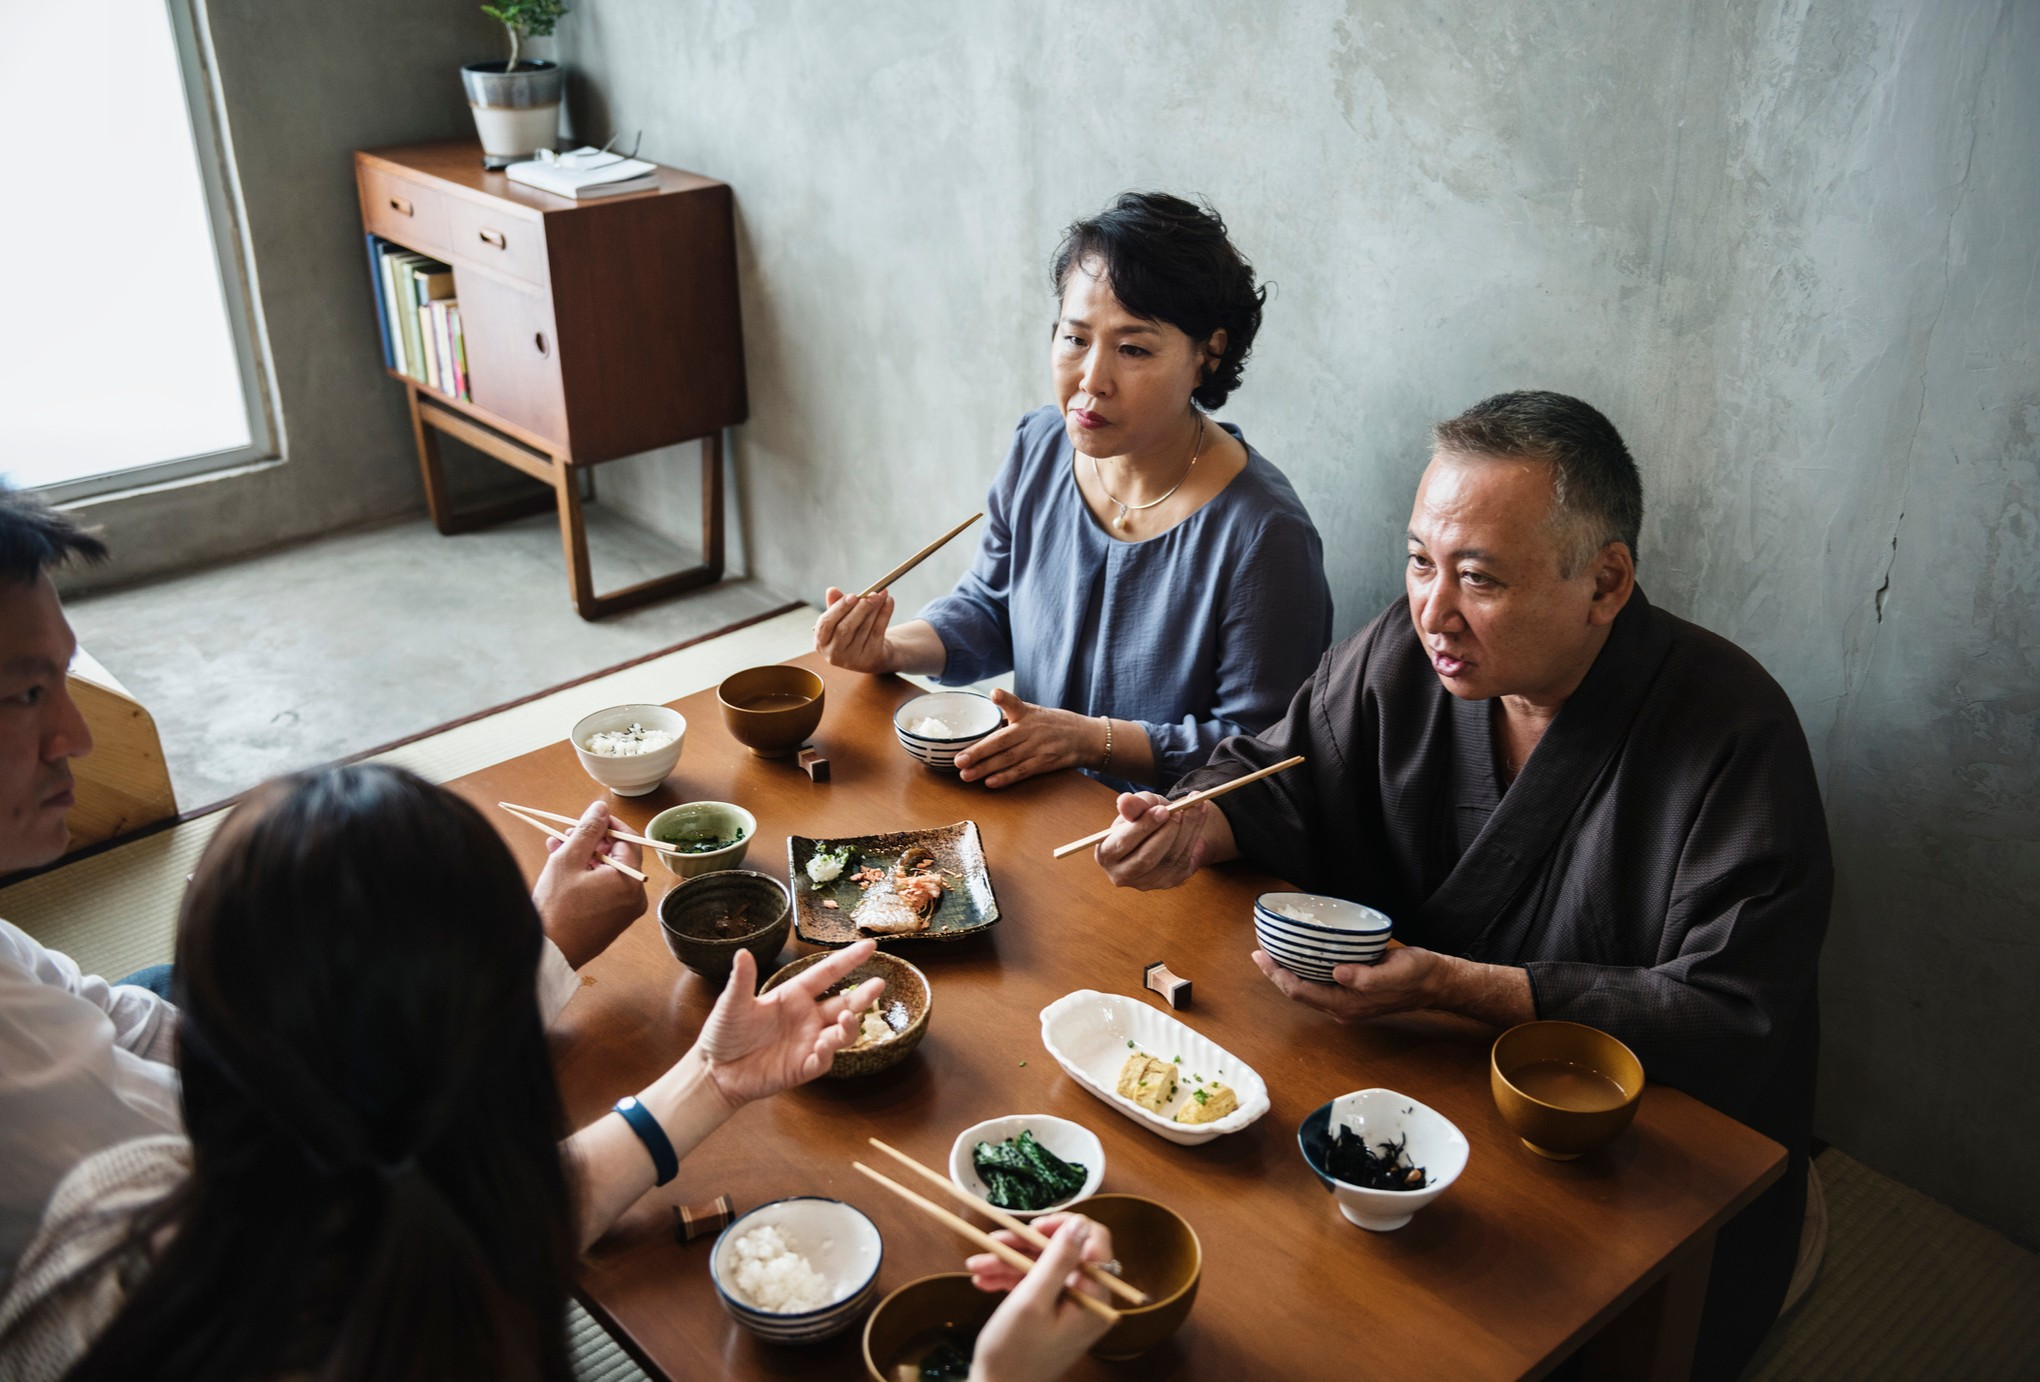 9 Masalah Umum Seputar Mertua Dan Kiat Menghadapinya